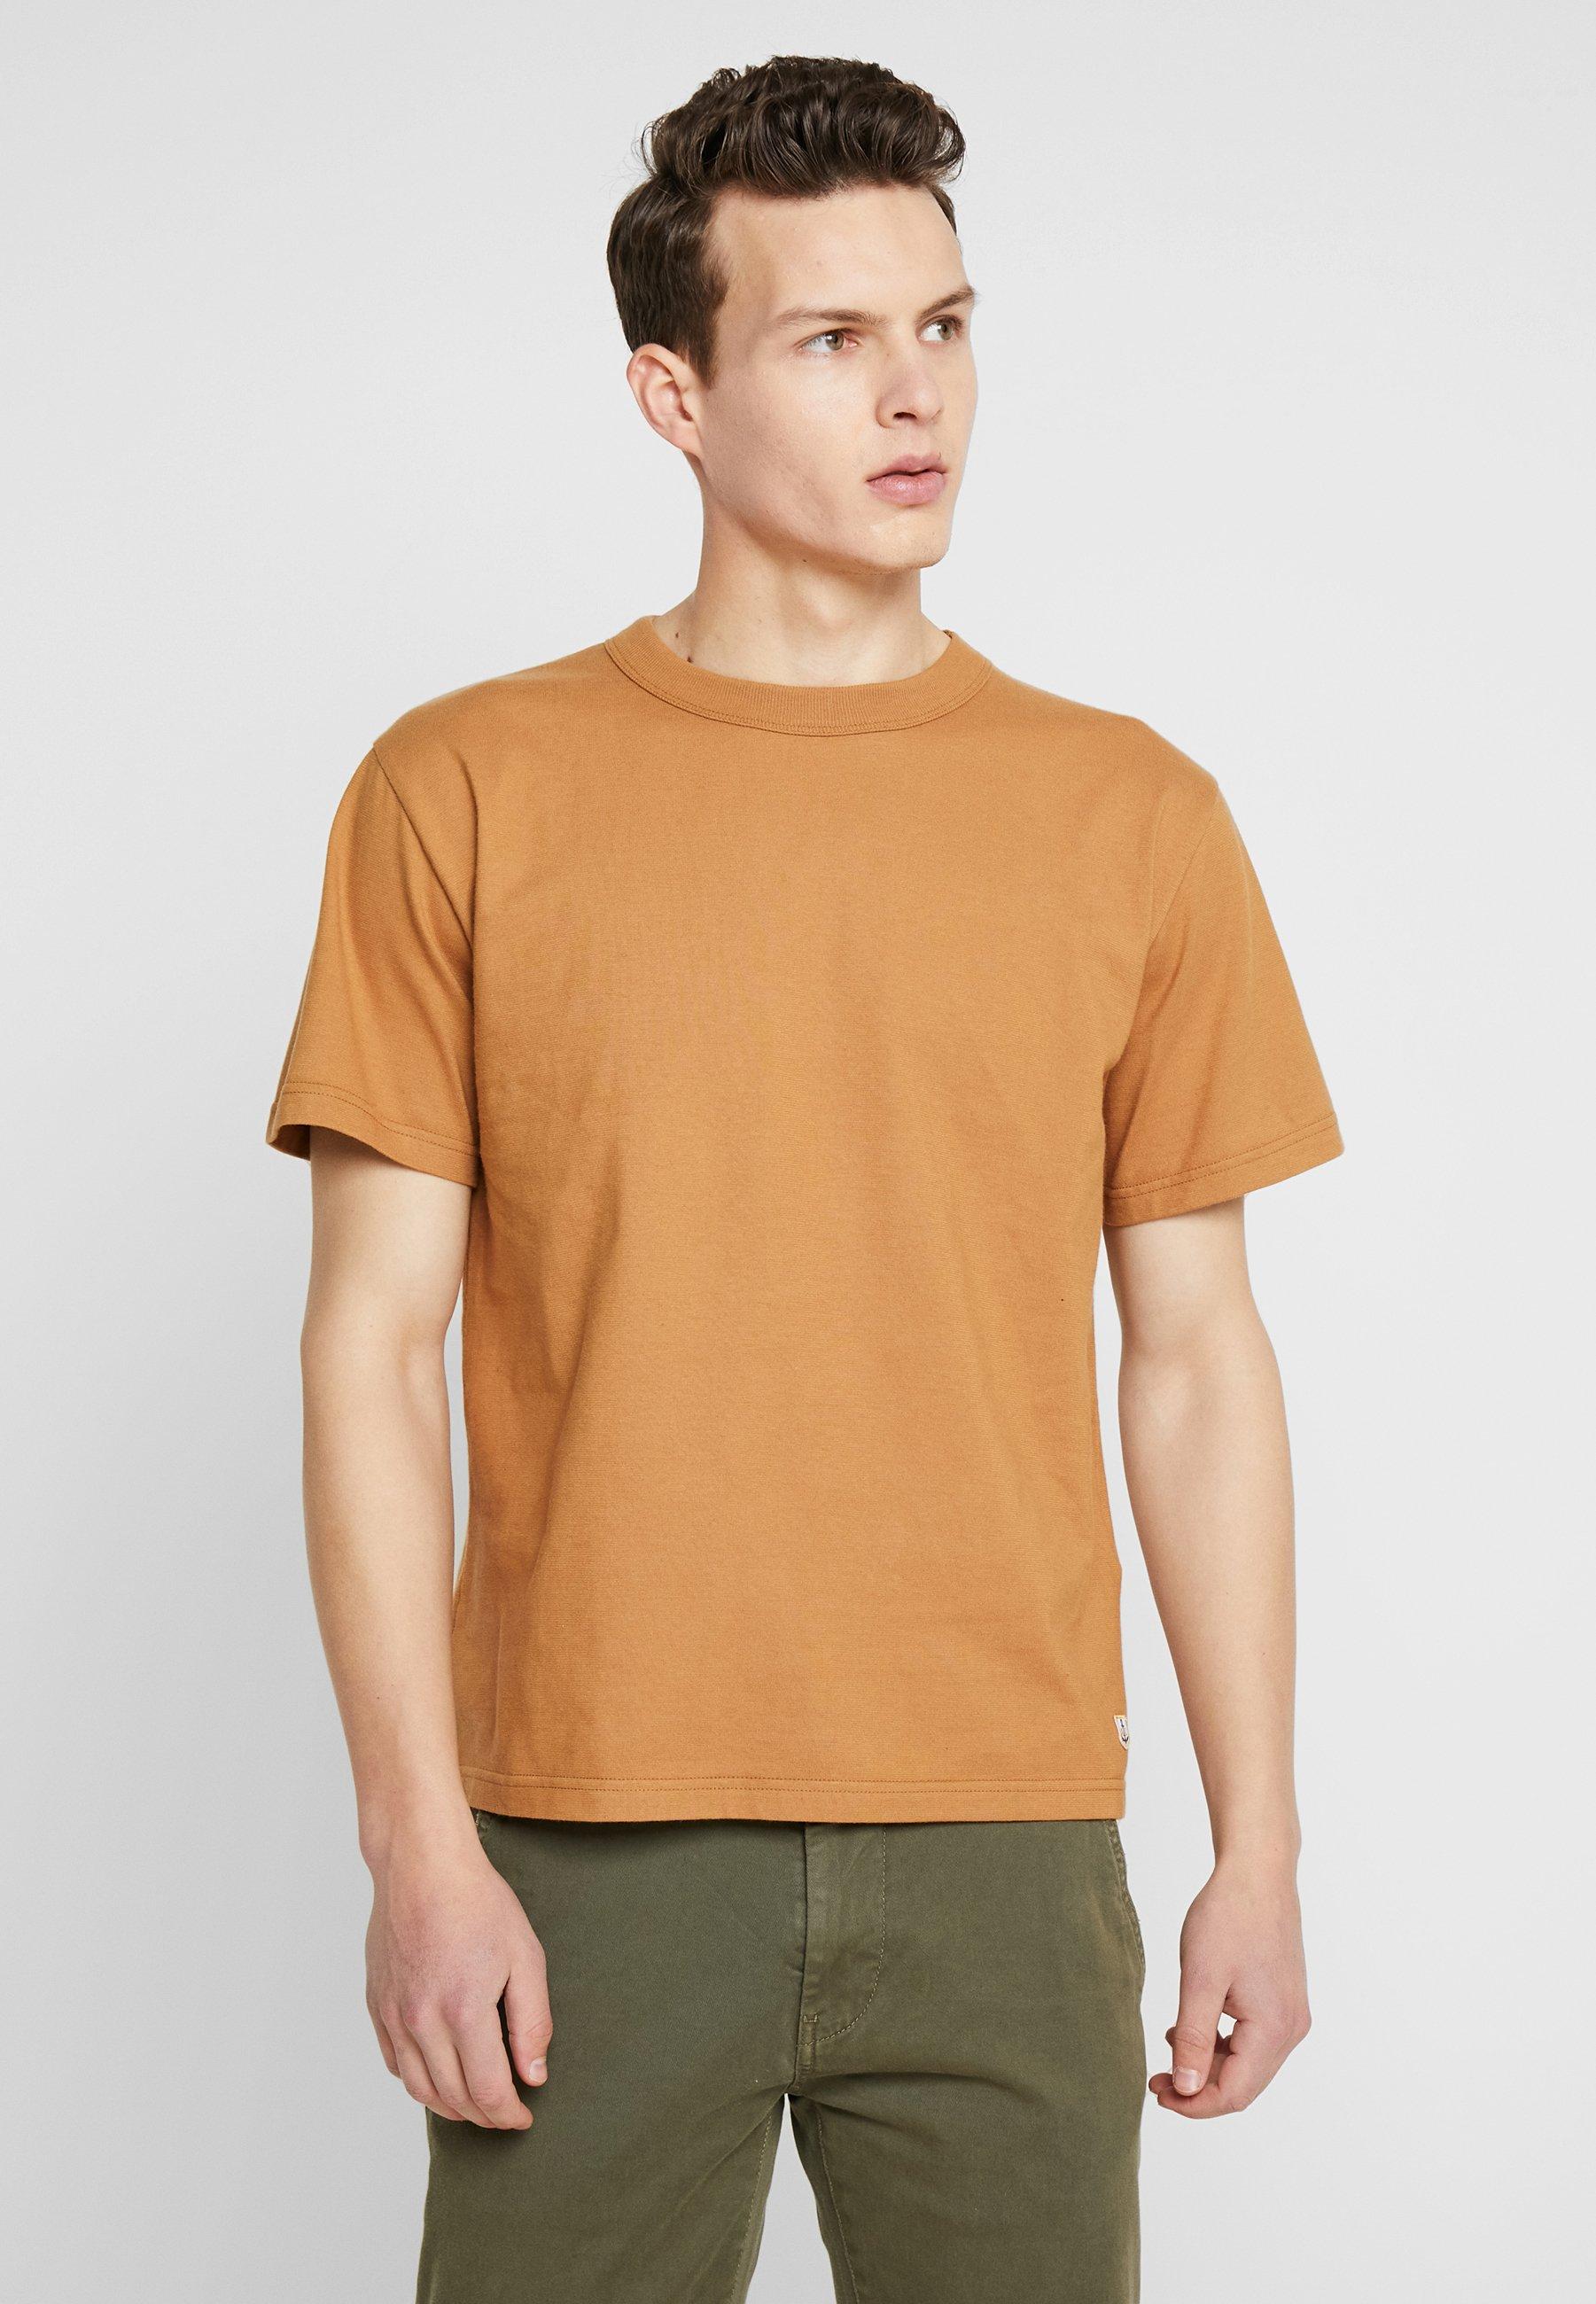 Origine CallacT Basique shirt Lux Armor m8w0Nn